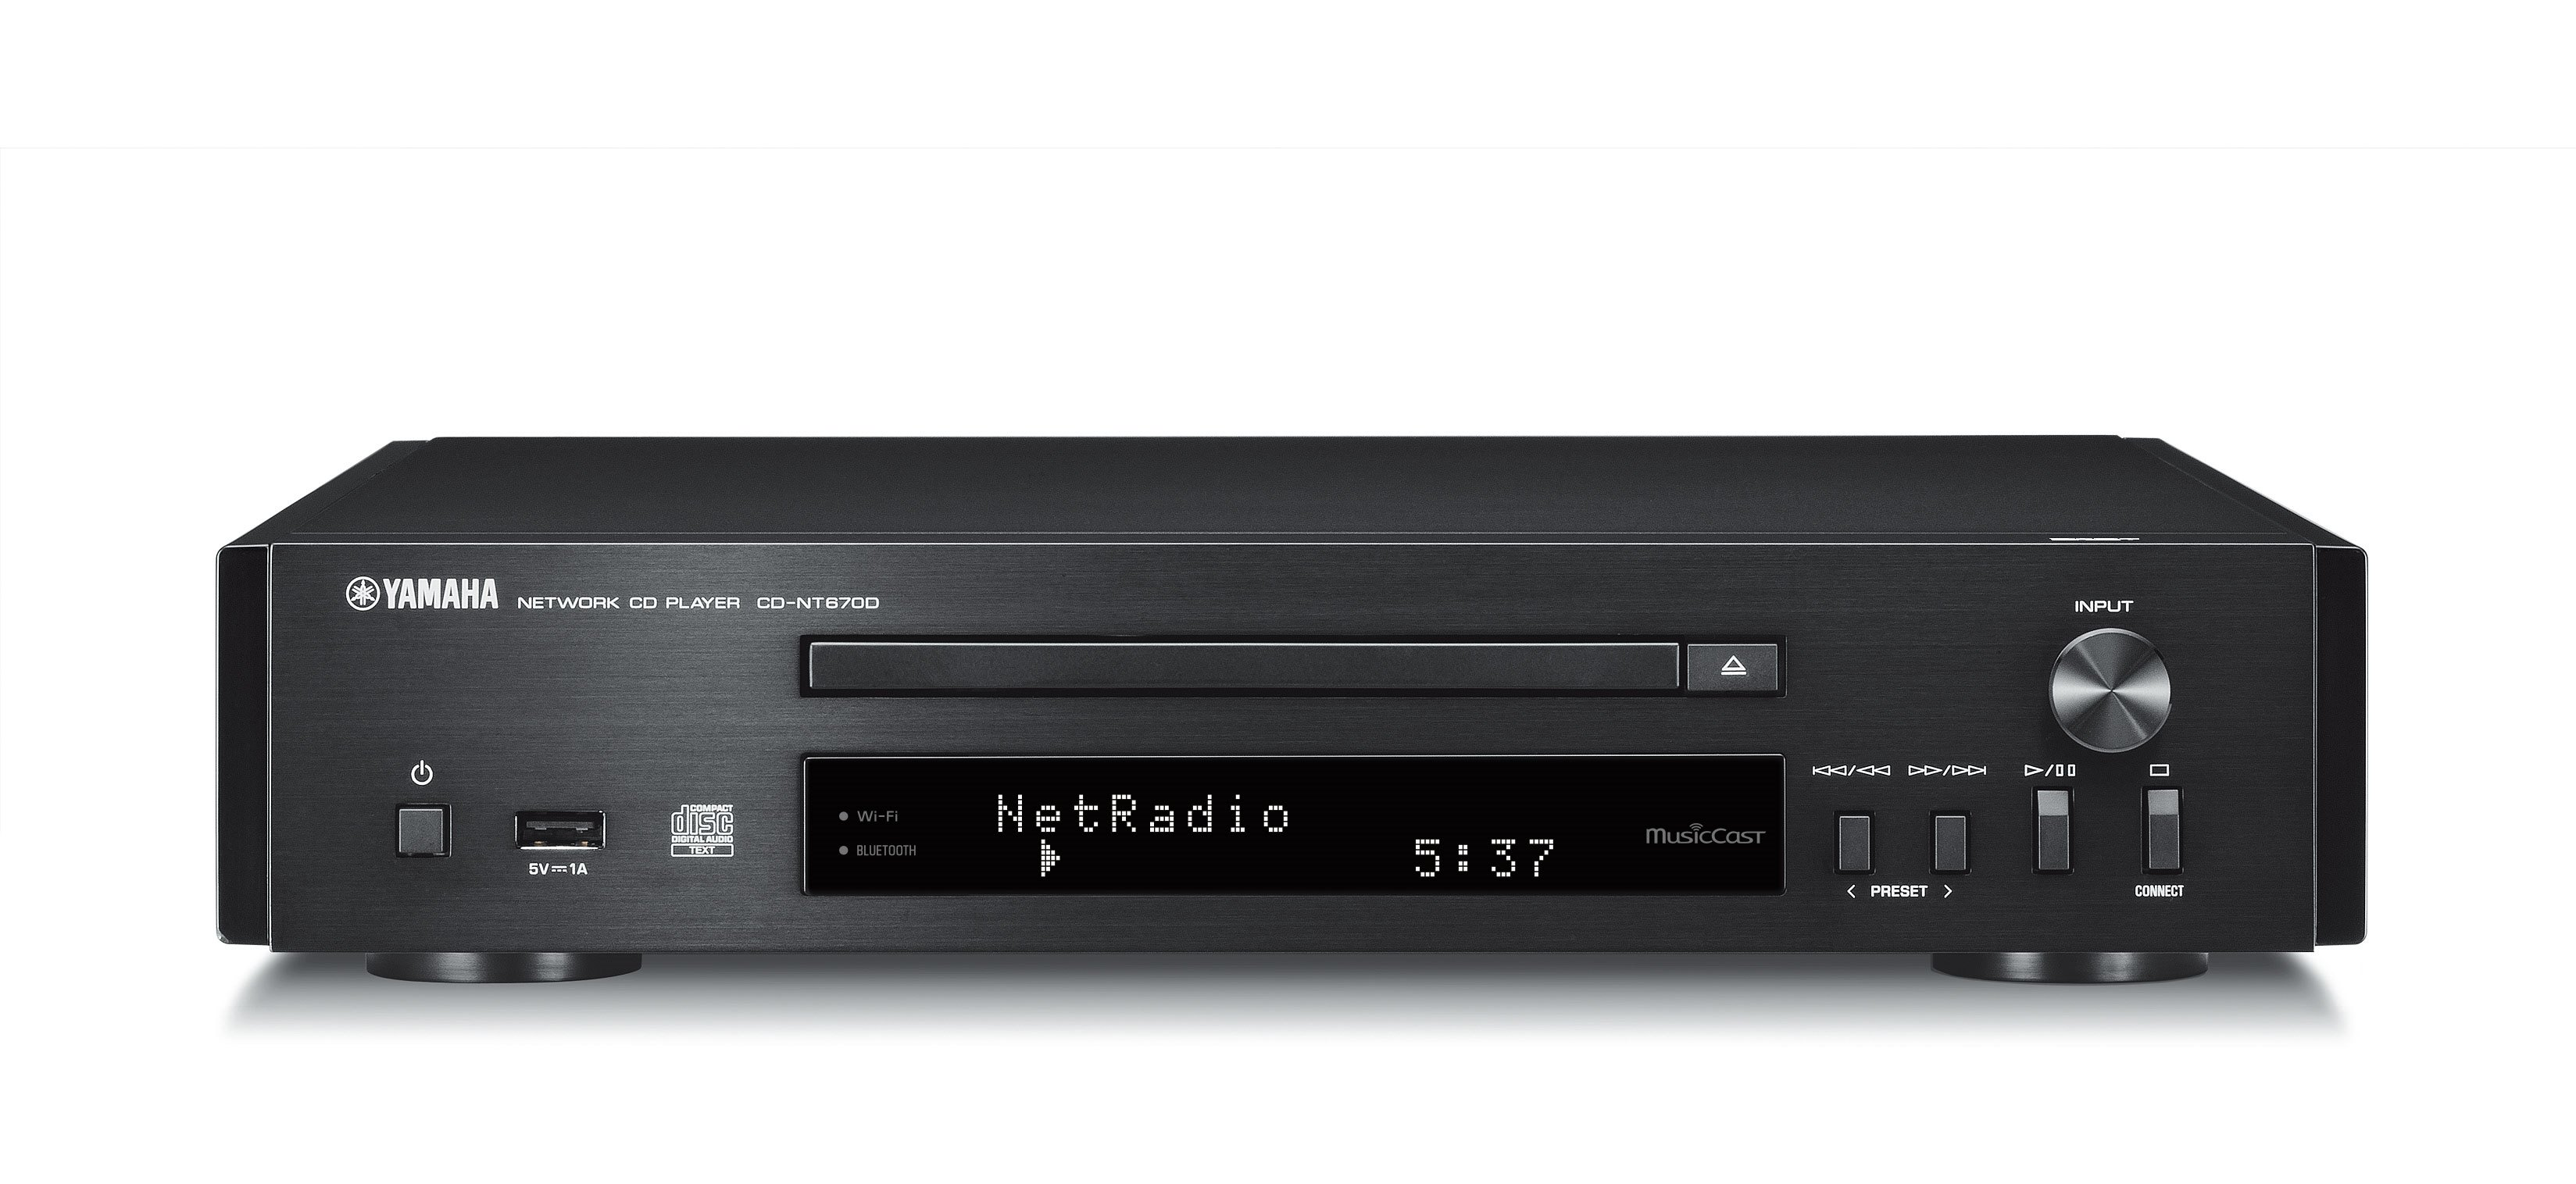 Yamaha Cdnt670d Streamer E Network Player Dolfi Hi Fi